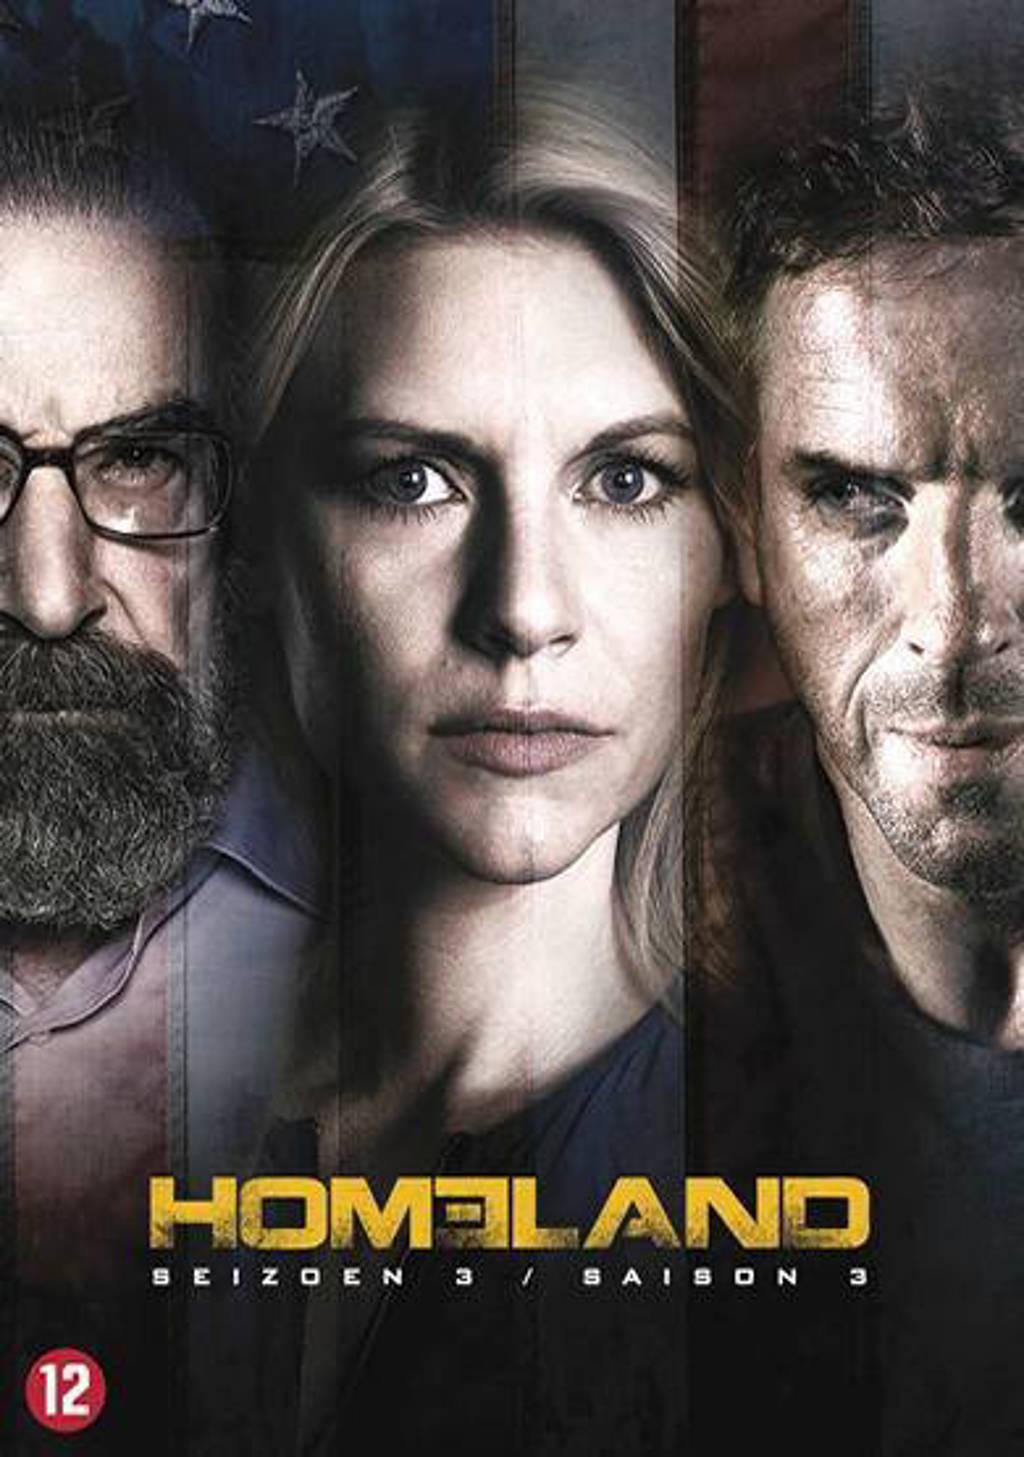 Homeland - Seizoen 3 (DVD)